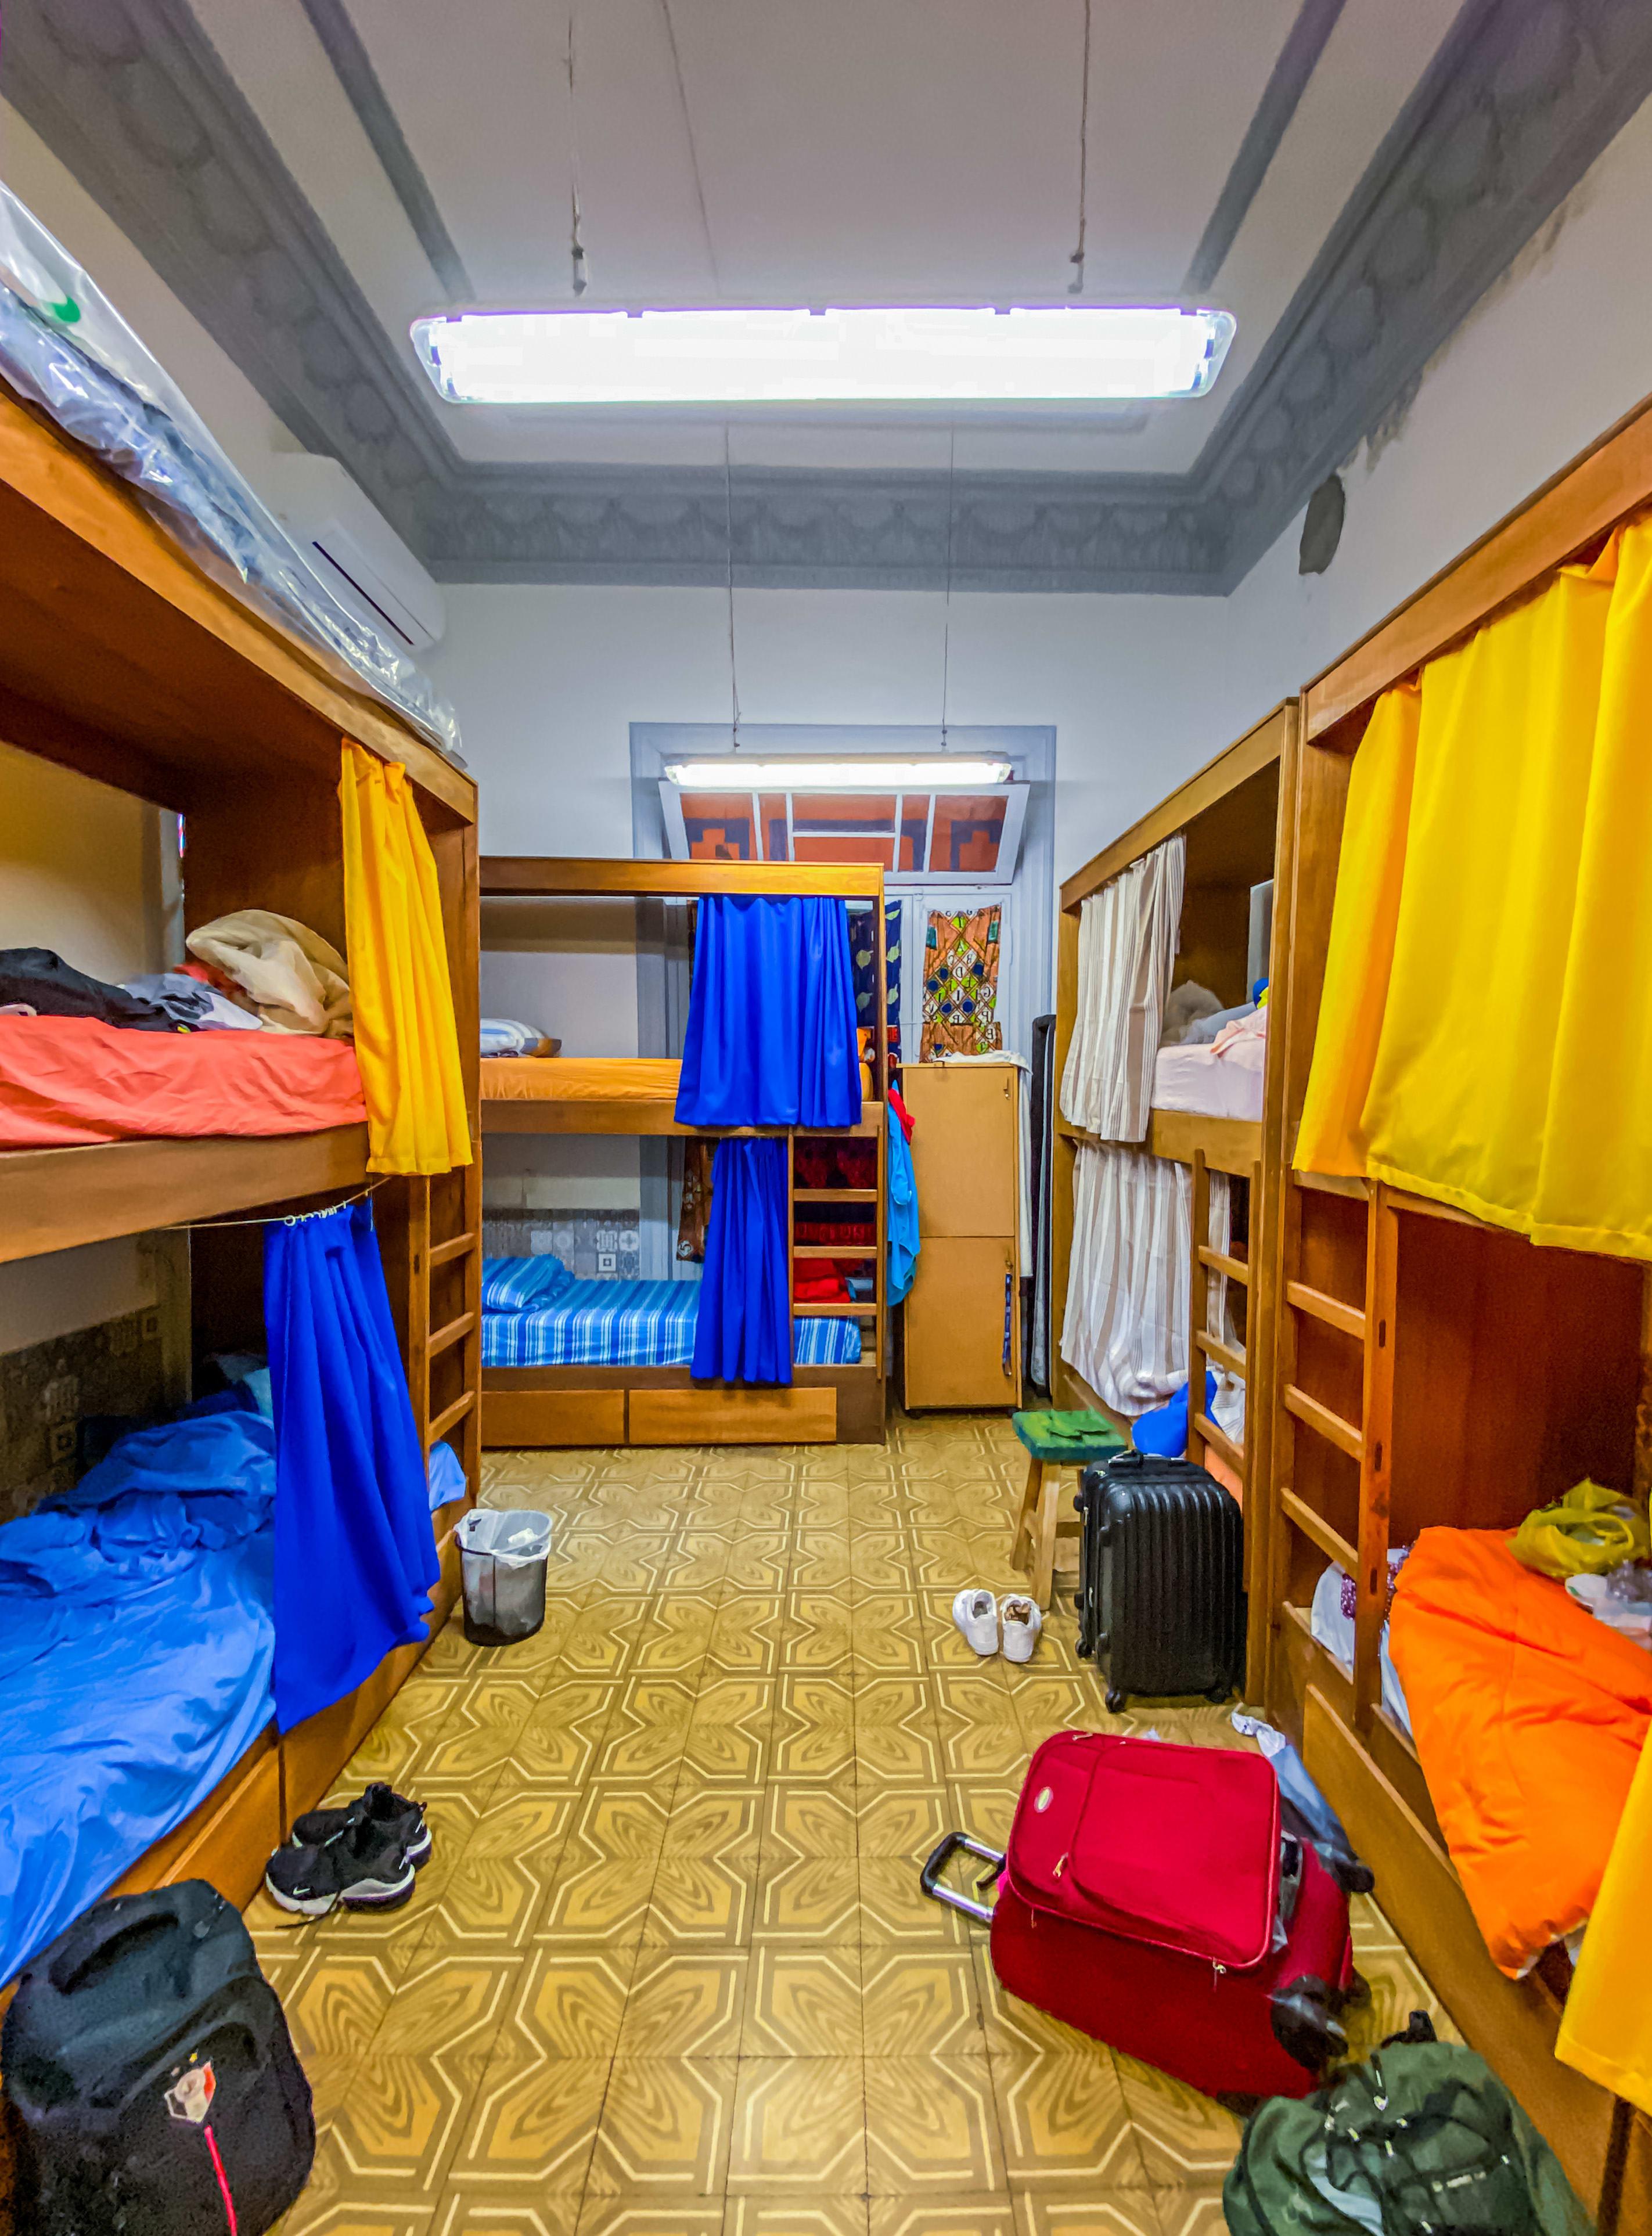 HOSTEL - Hostel Charruas